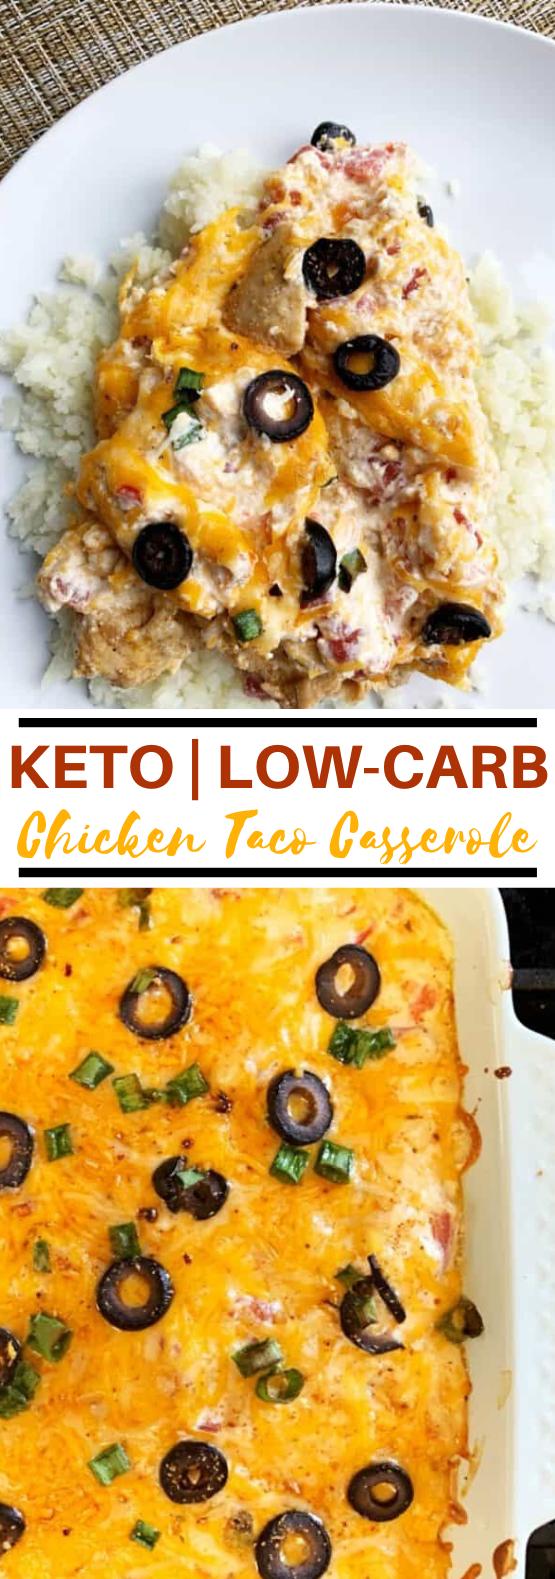 KETO CHICKEN TACO CASSEROLE #lowcarb #dinner #keto #diet #casserole